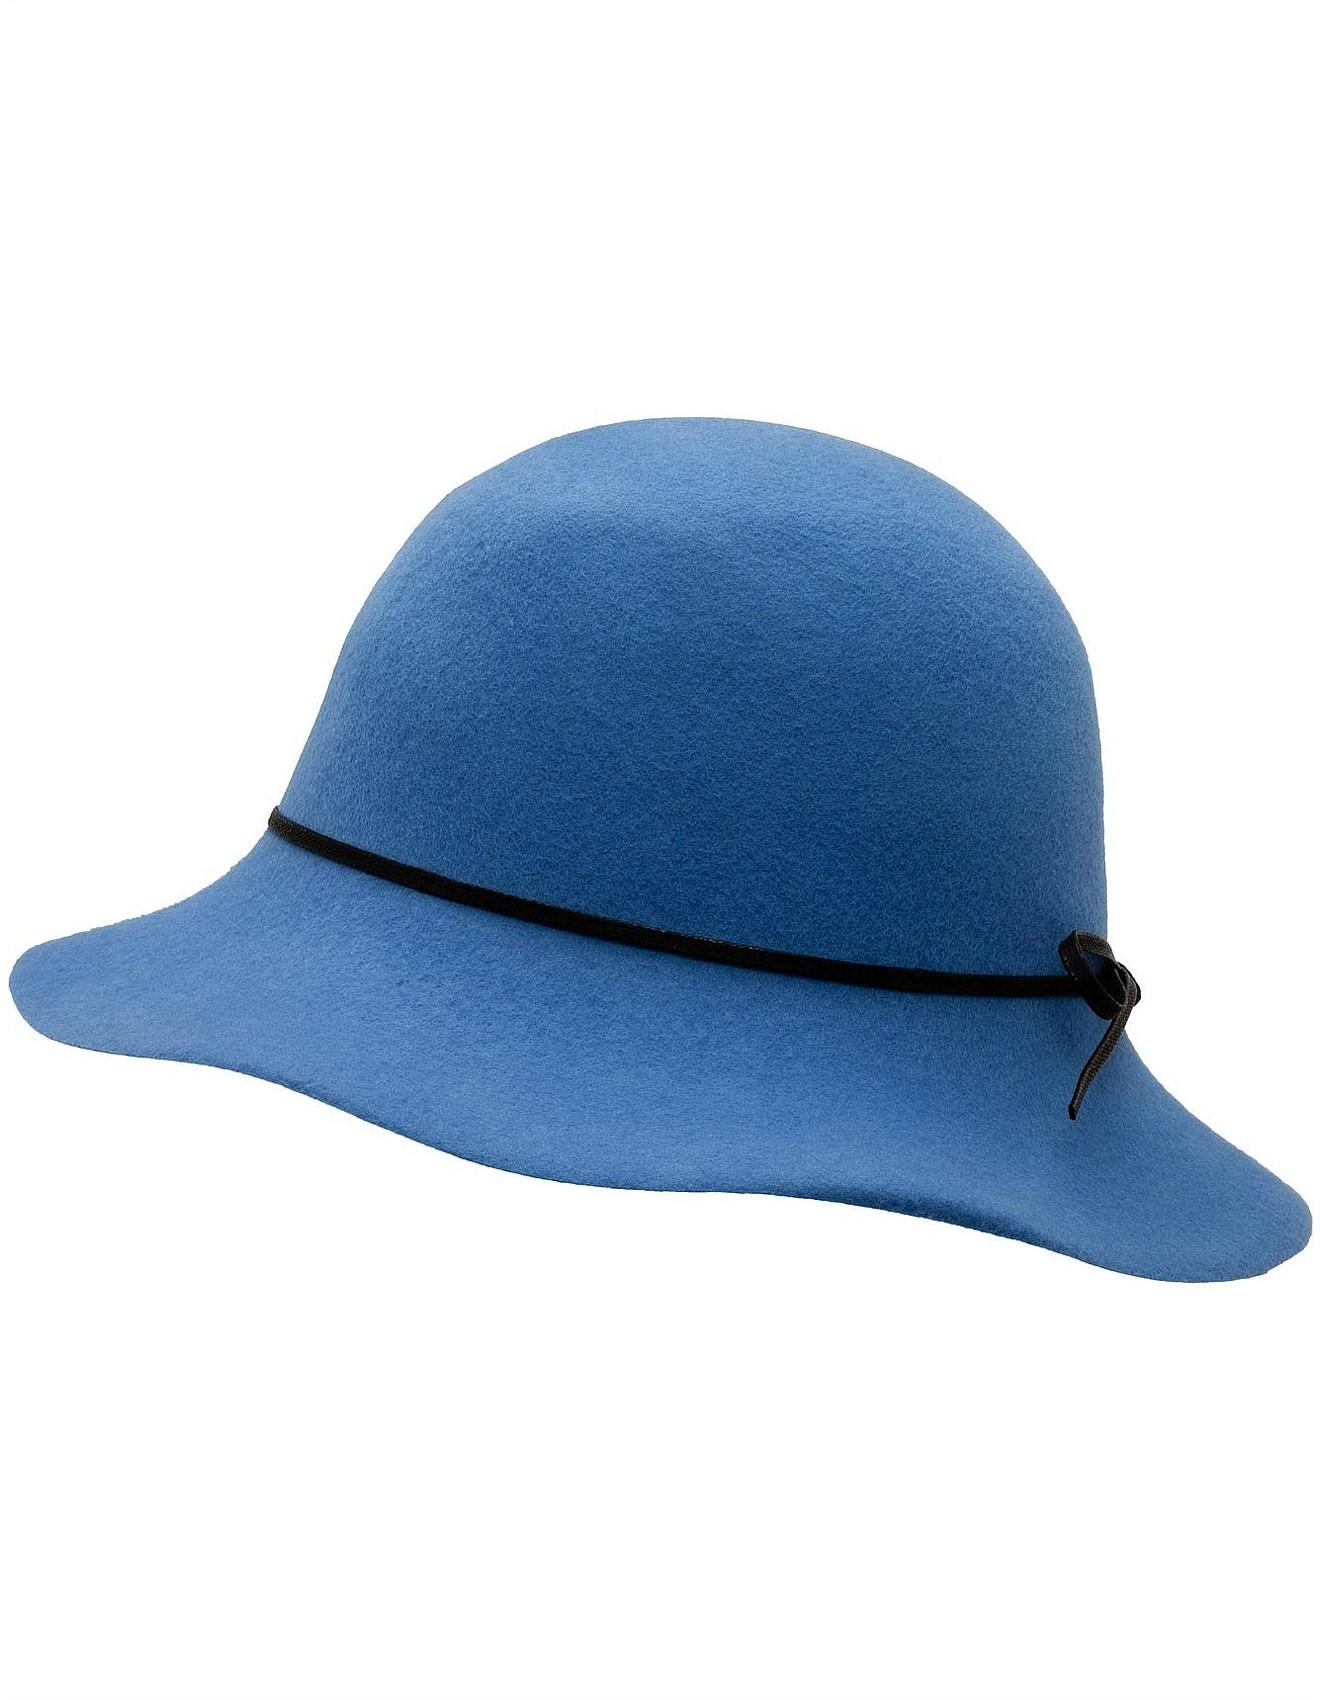 19fc4115713 FLOPPY CLOCHE HAT